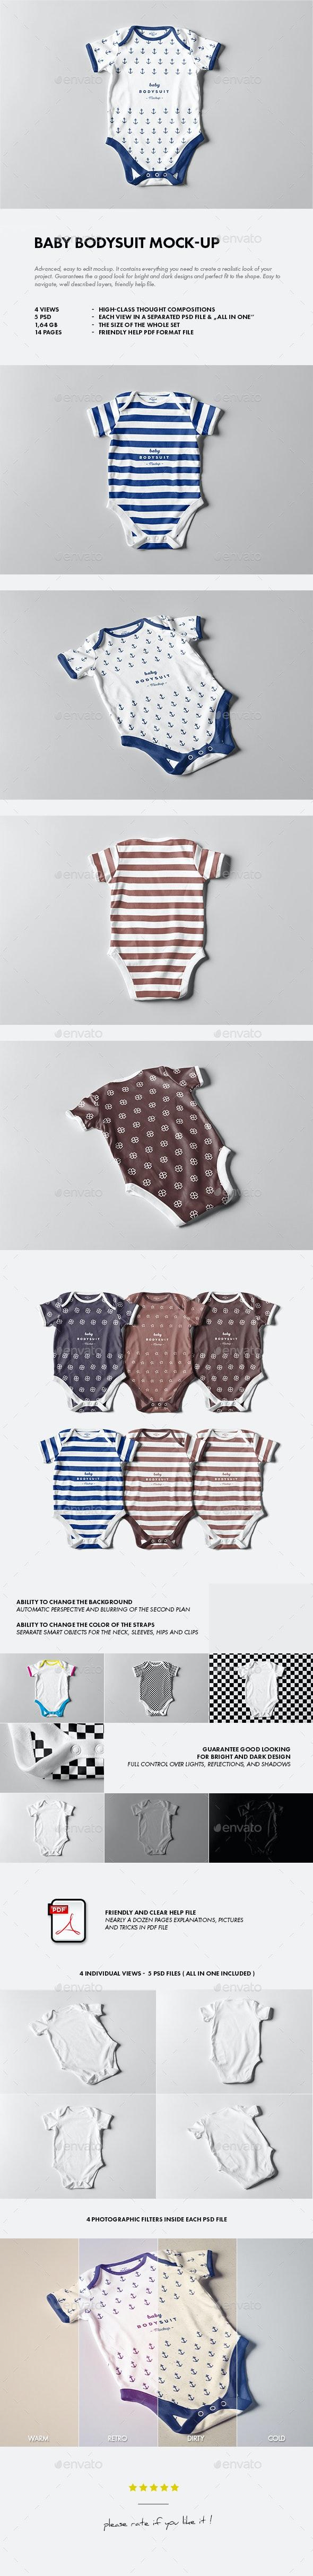 Baby Bodysuit Mock-up - Miscellaneous Apparel